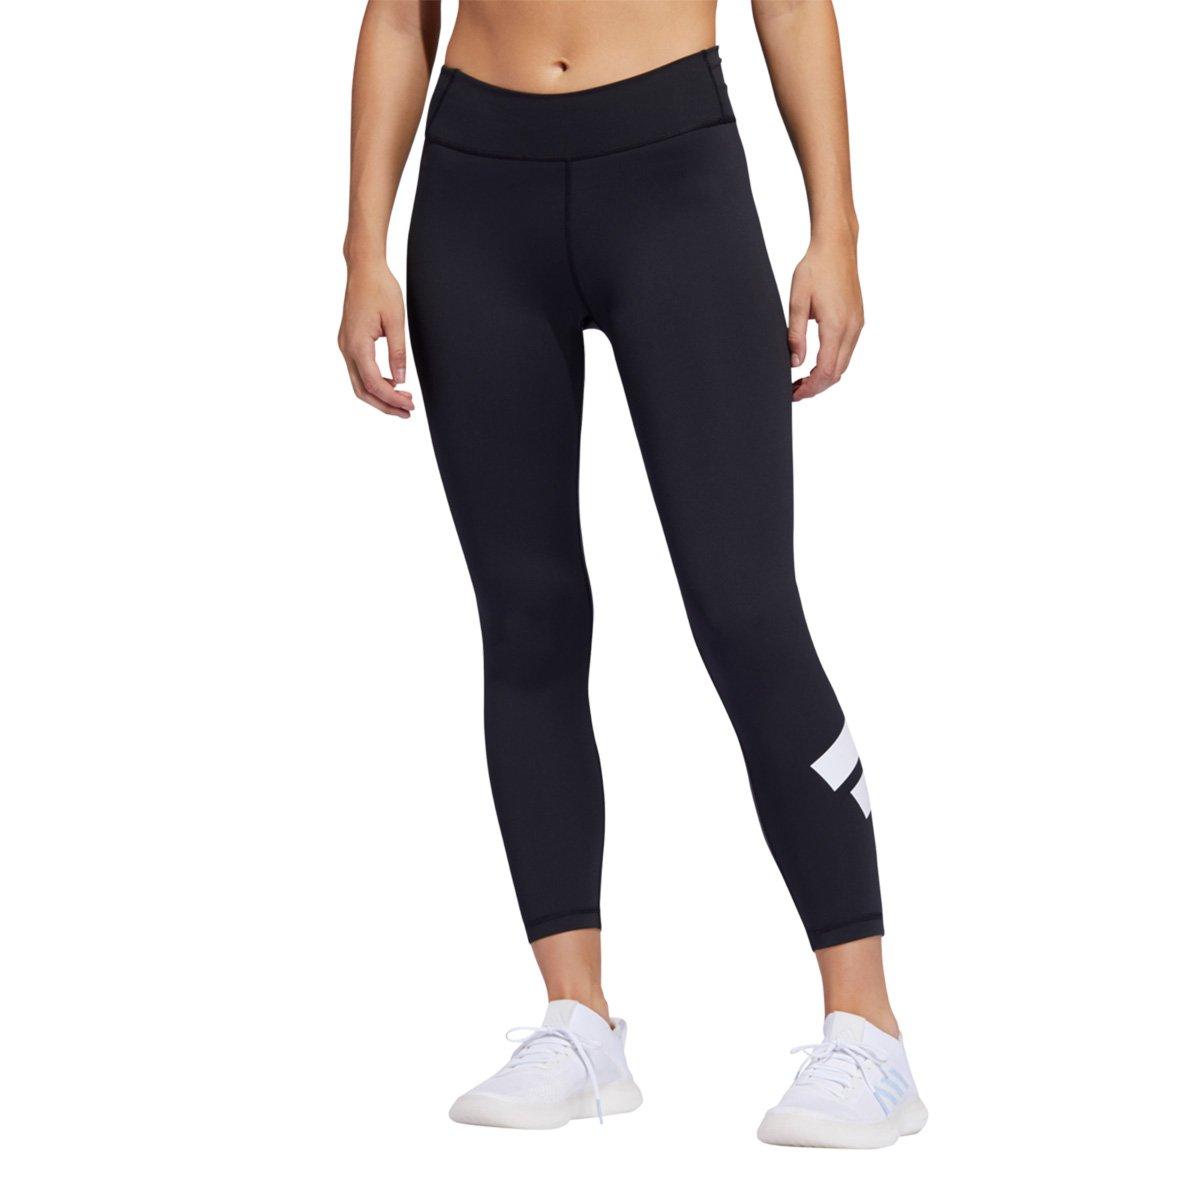 Calça Legging Adidas Cir Bos Feminina